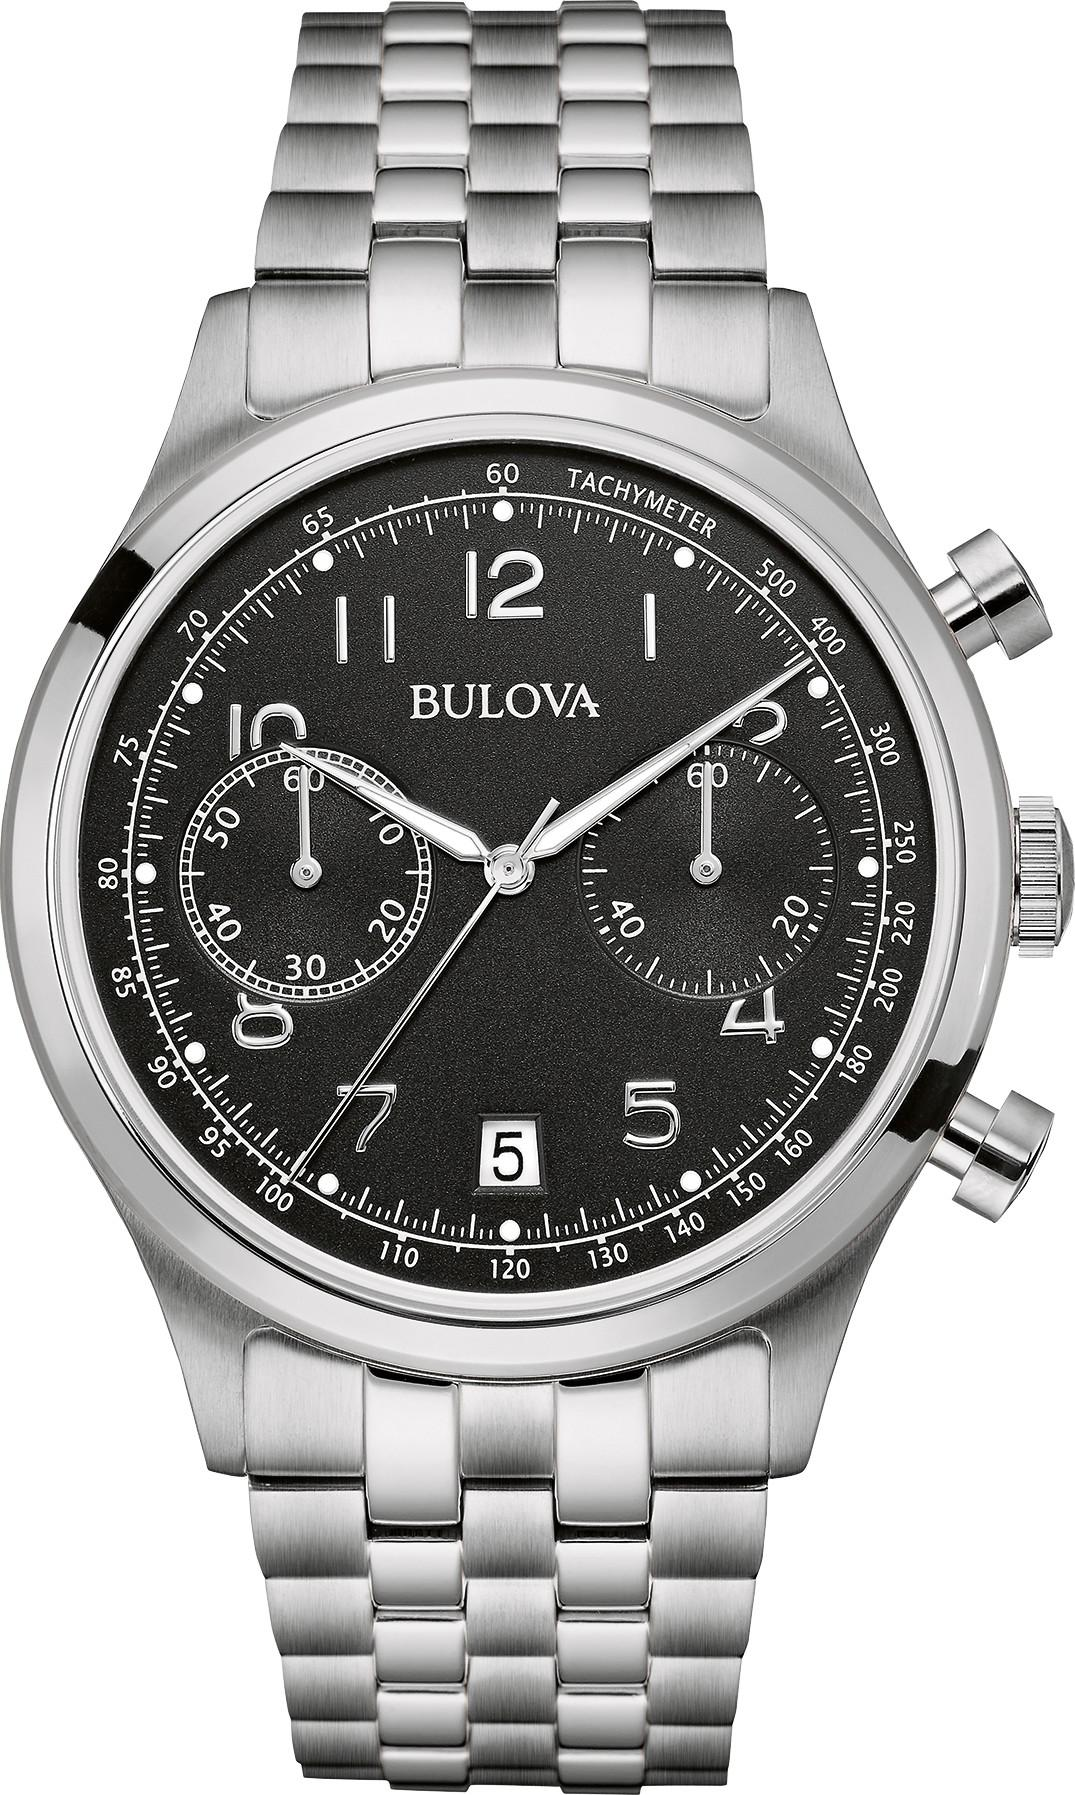 BULOVA MEN'S VINTAGE CHRONOGRAPH WATCH 43MM